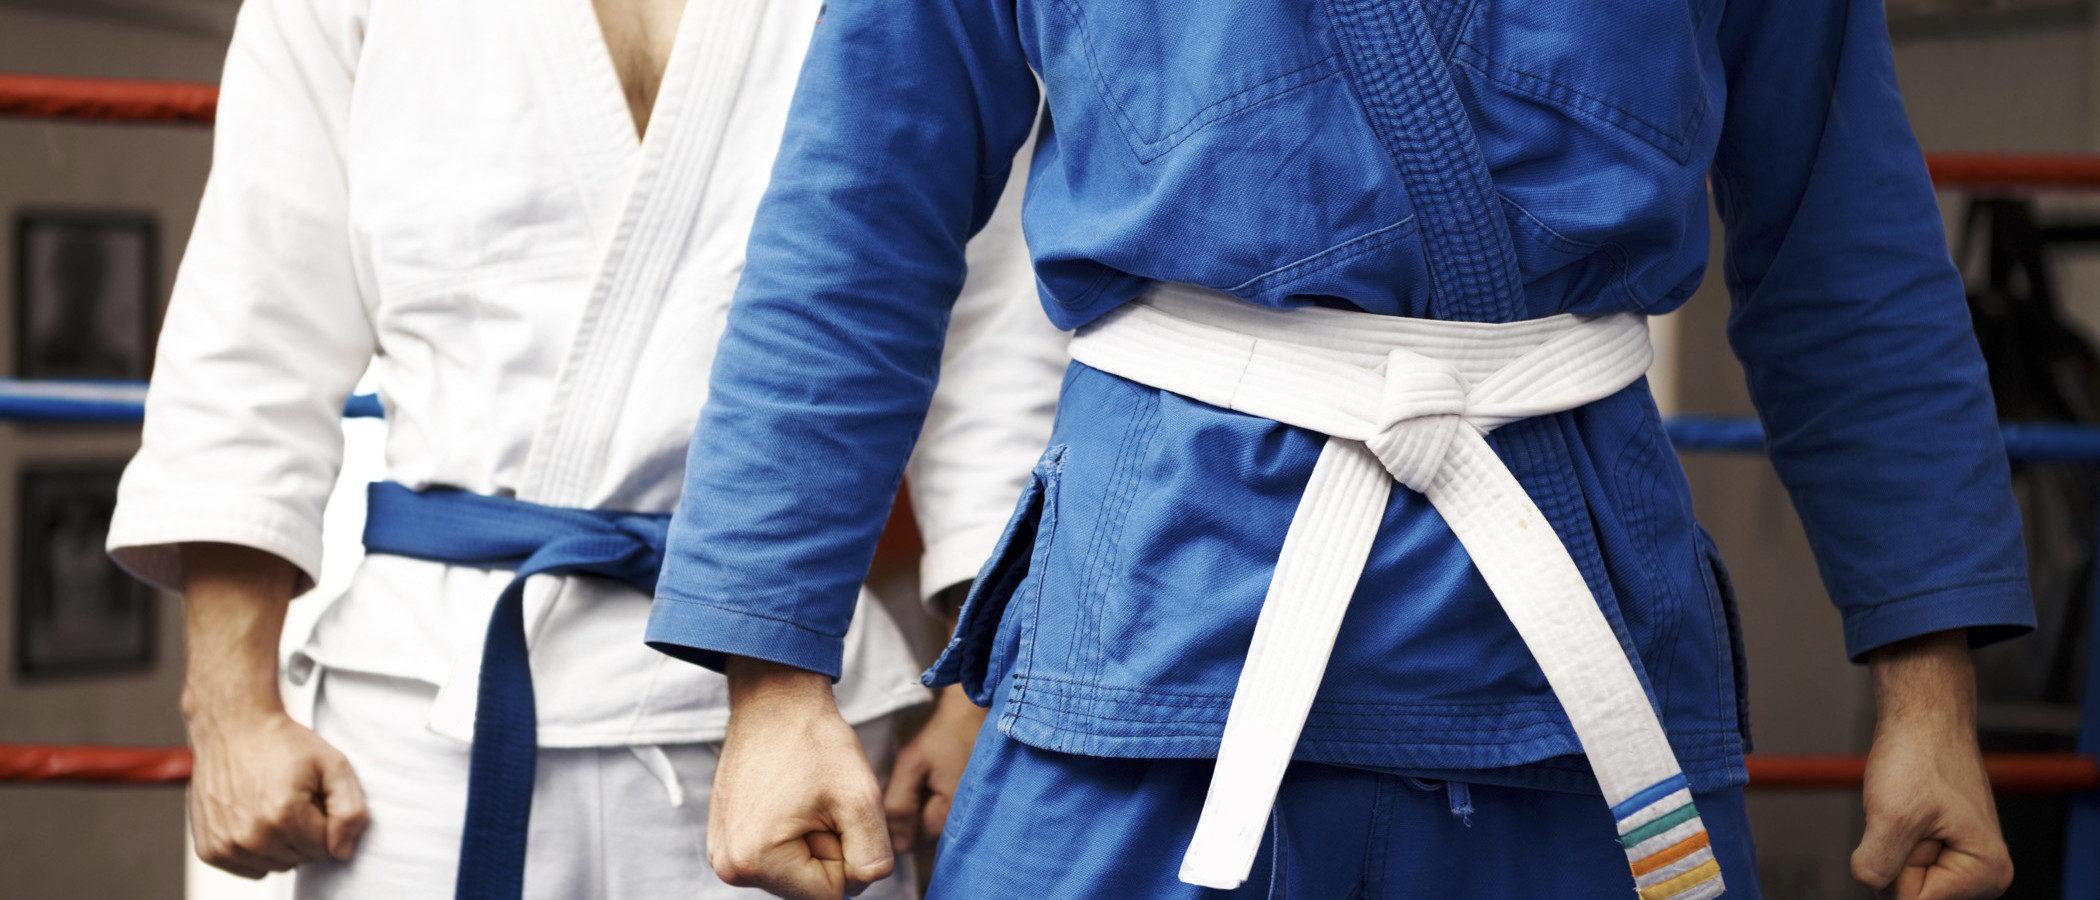 Actividades extraescolares: judo, kárate y taekwondo